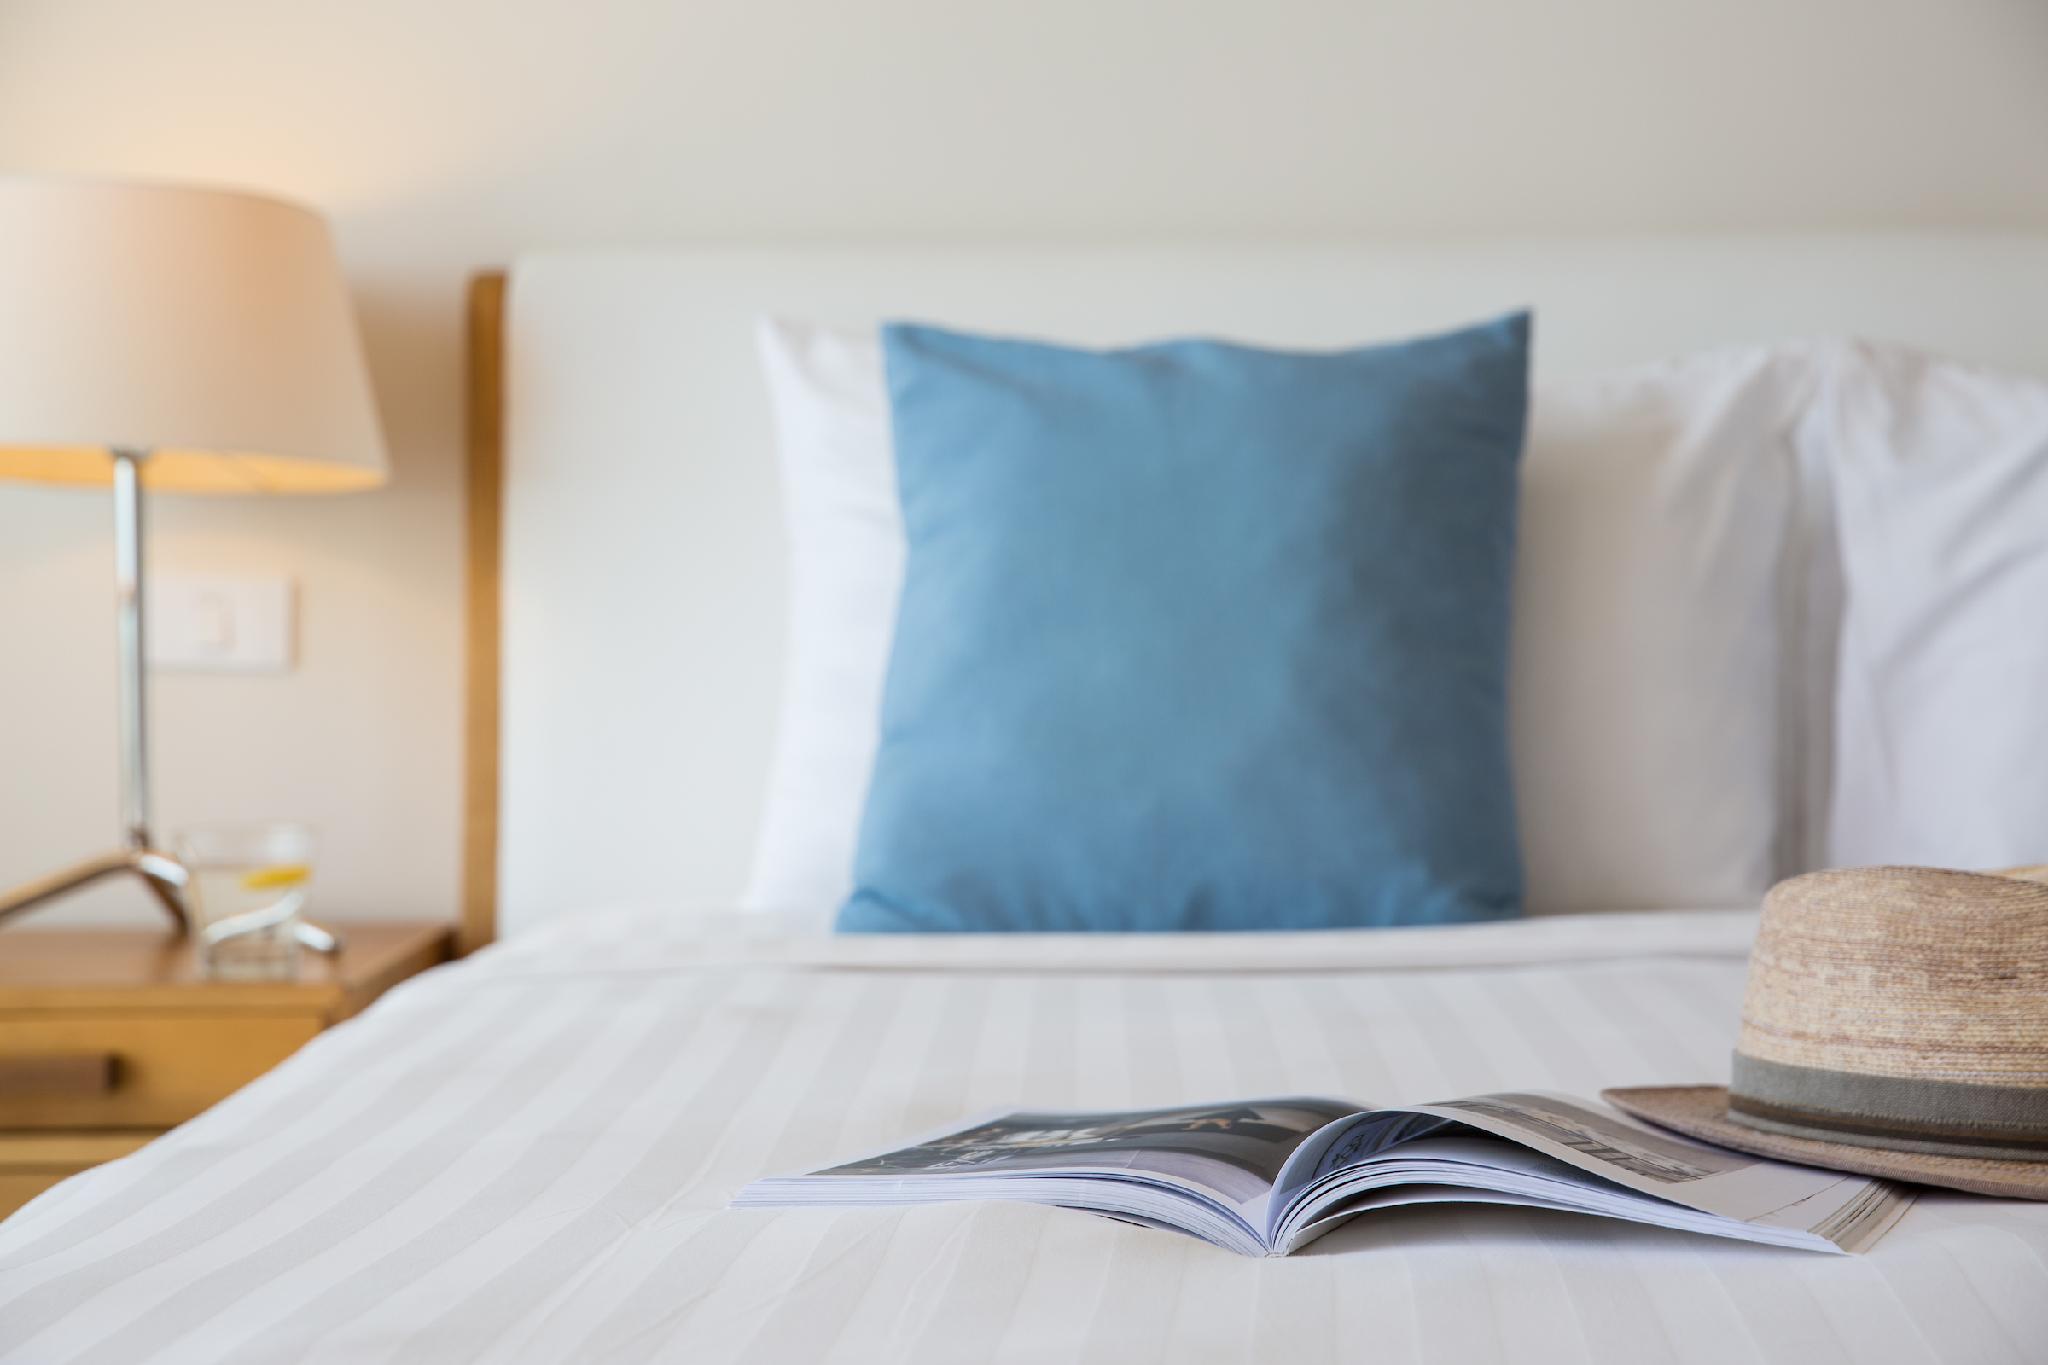 BLUE SAPPHIRE OCEAN VIEW วิลลา 3 ห้องนอน 3 ห้องน้ำส่วนตัว ขนาด 310 ตร.ม. – เชิงมน